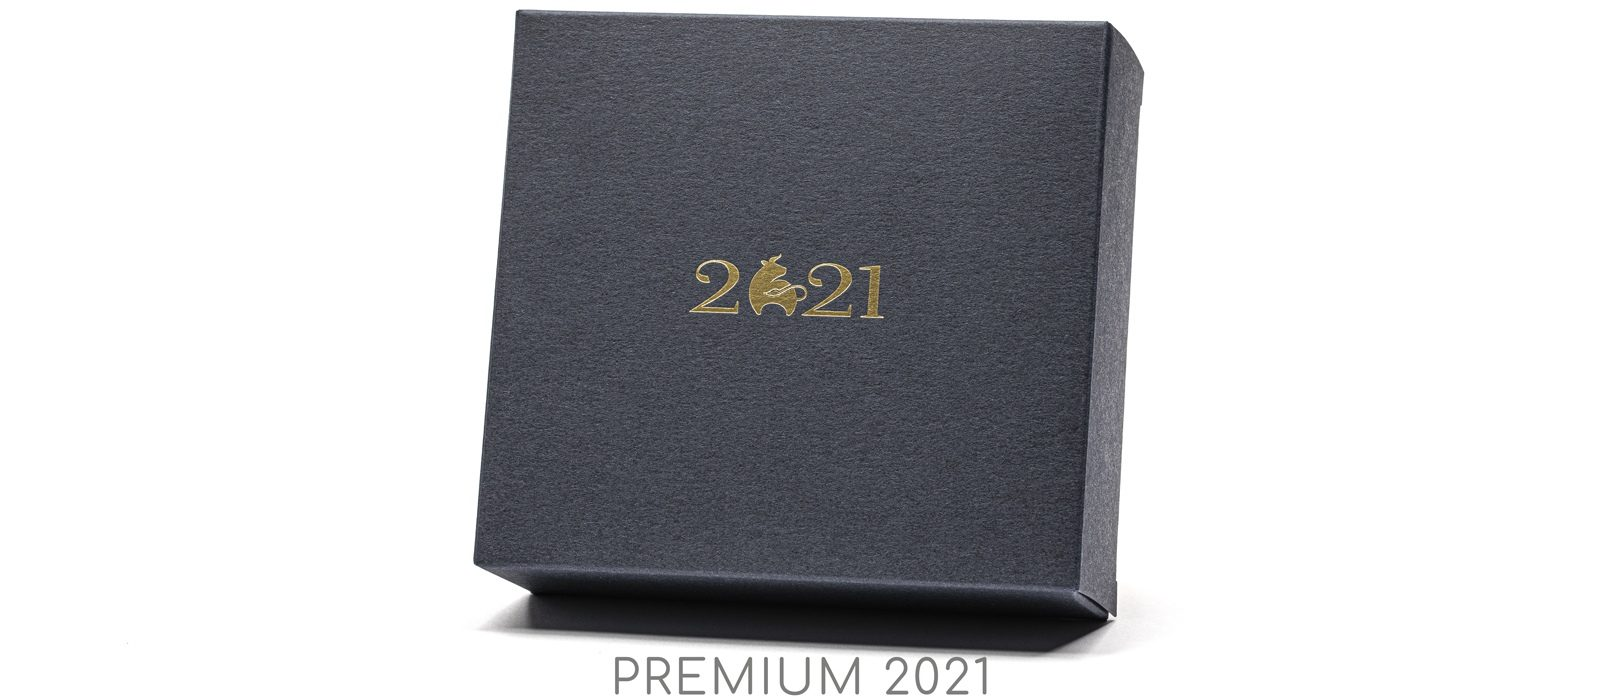 Упаковка для календаря ПРЕЗИДЕНТ PRESIDENT PREMIUM 2021